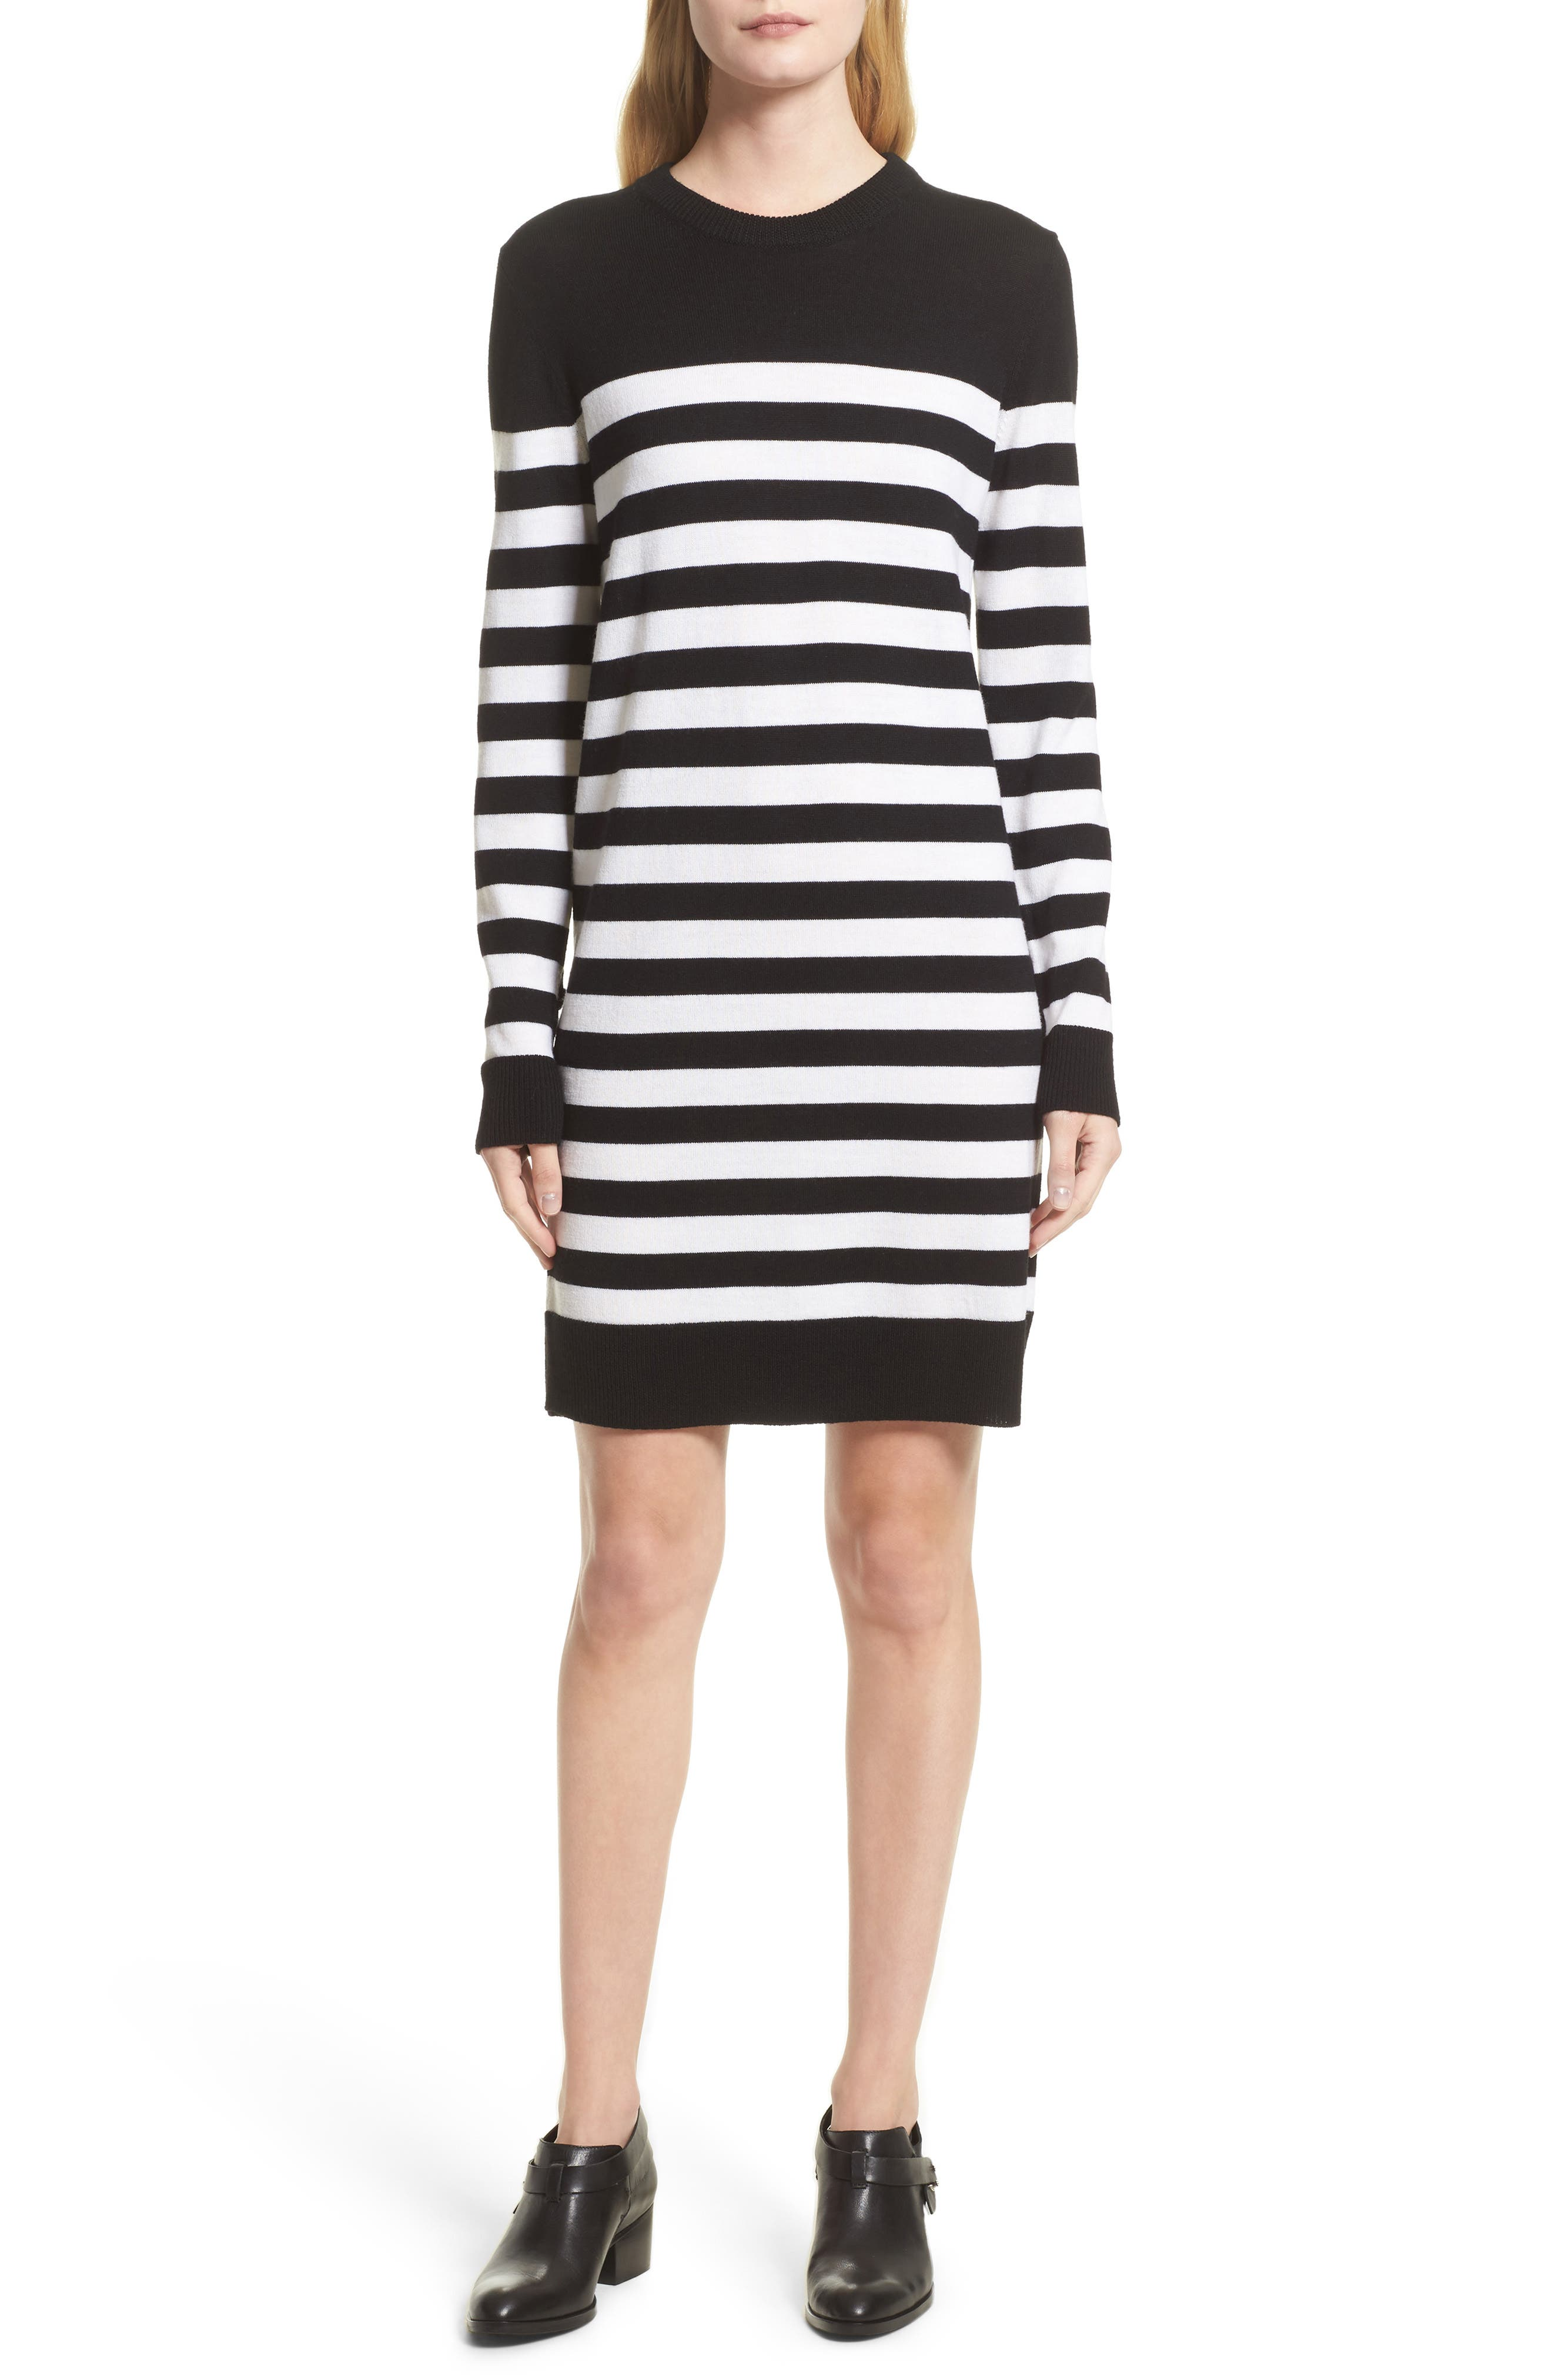 Alternate Image 1 Selected - rag & bone Lilian Stripe Merino Wool Dress (Nordstrom Exclusive)